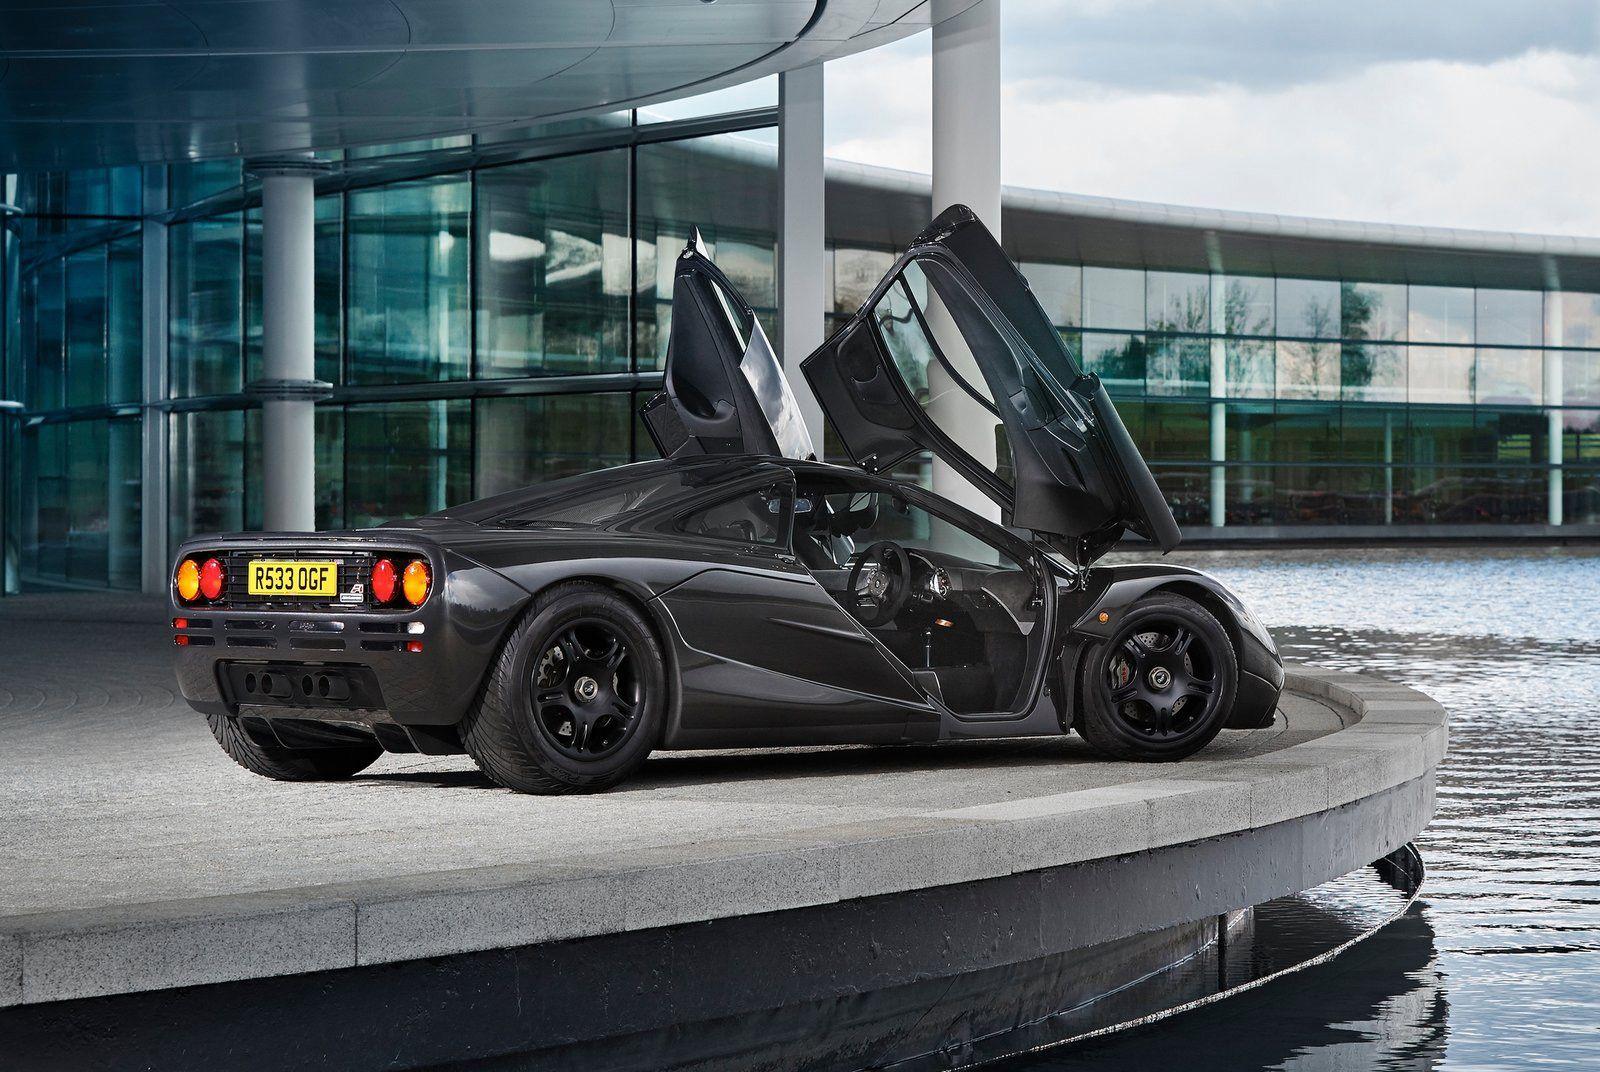 Mclaren F1-Gear-Patrol-Slide-04